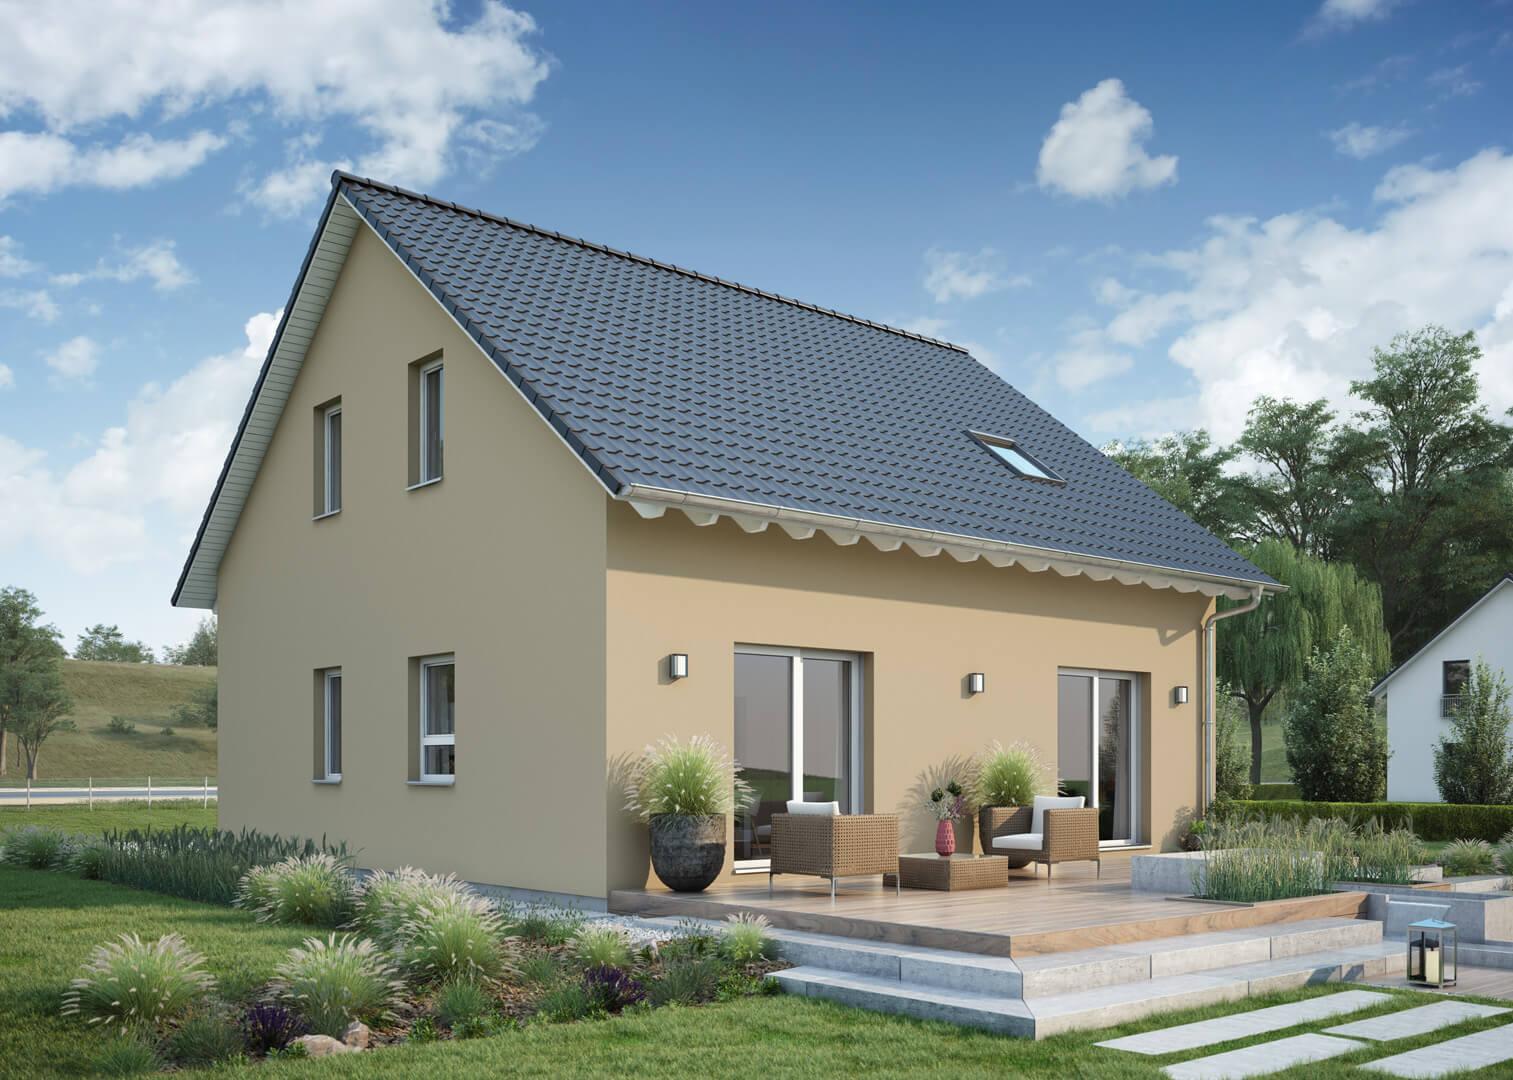 massa haus preisliste pdf haus image ideen. Black Bedroom Furniture Sets. Home Design Ideas